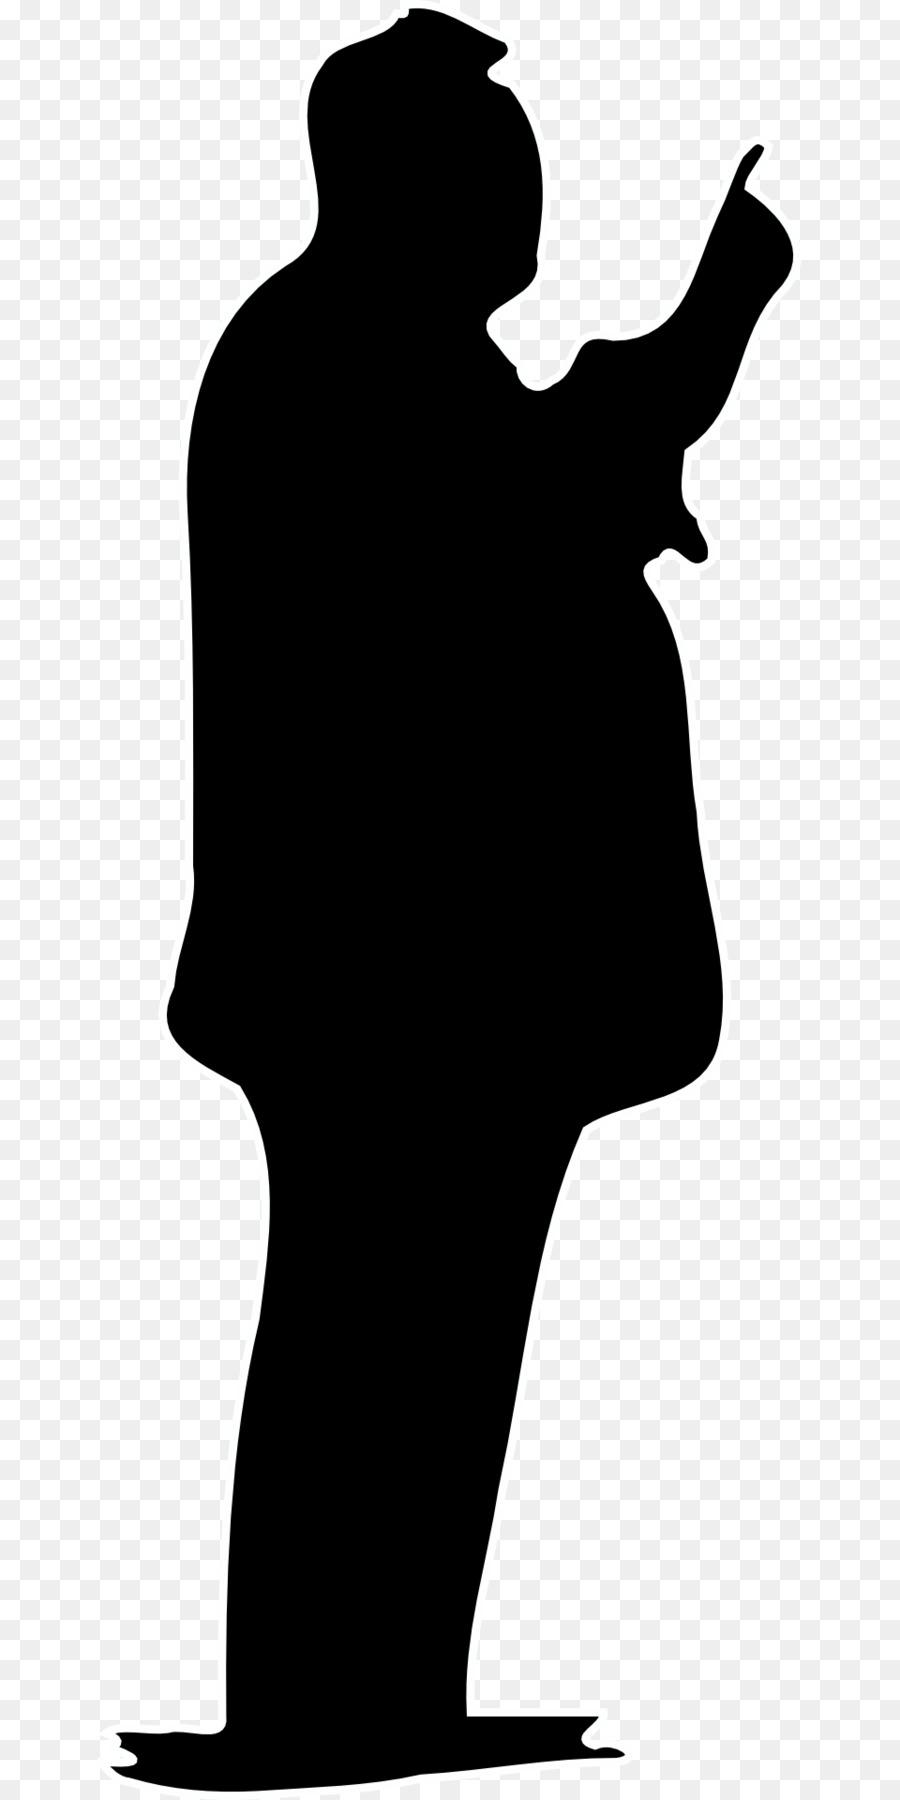 james bond silhouette clip art person with helmut png download rh kisspng com